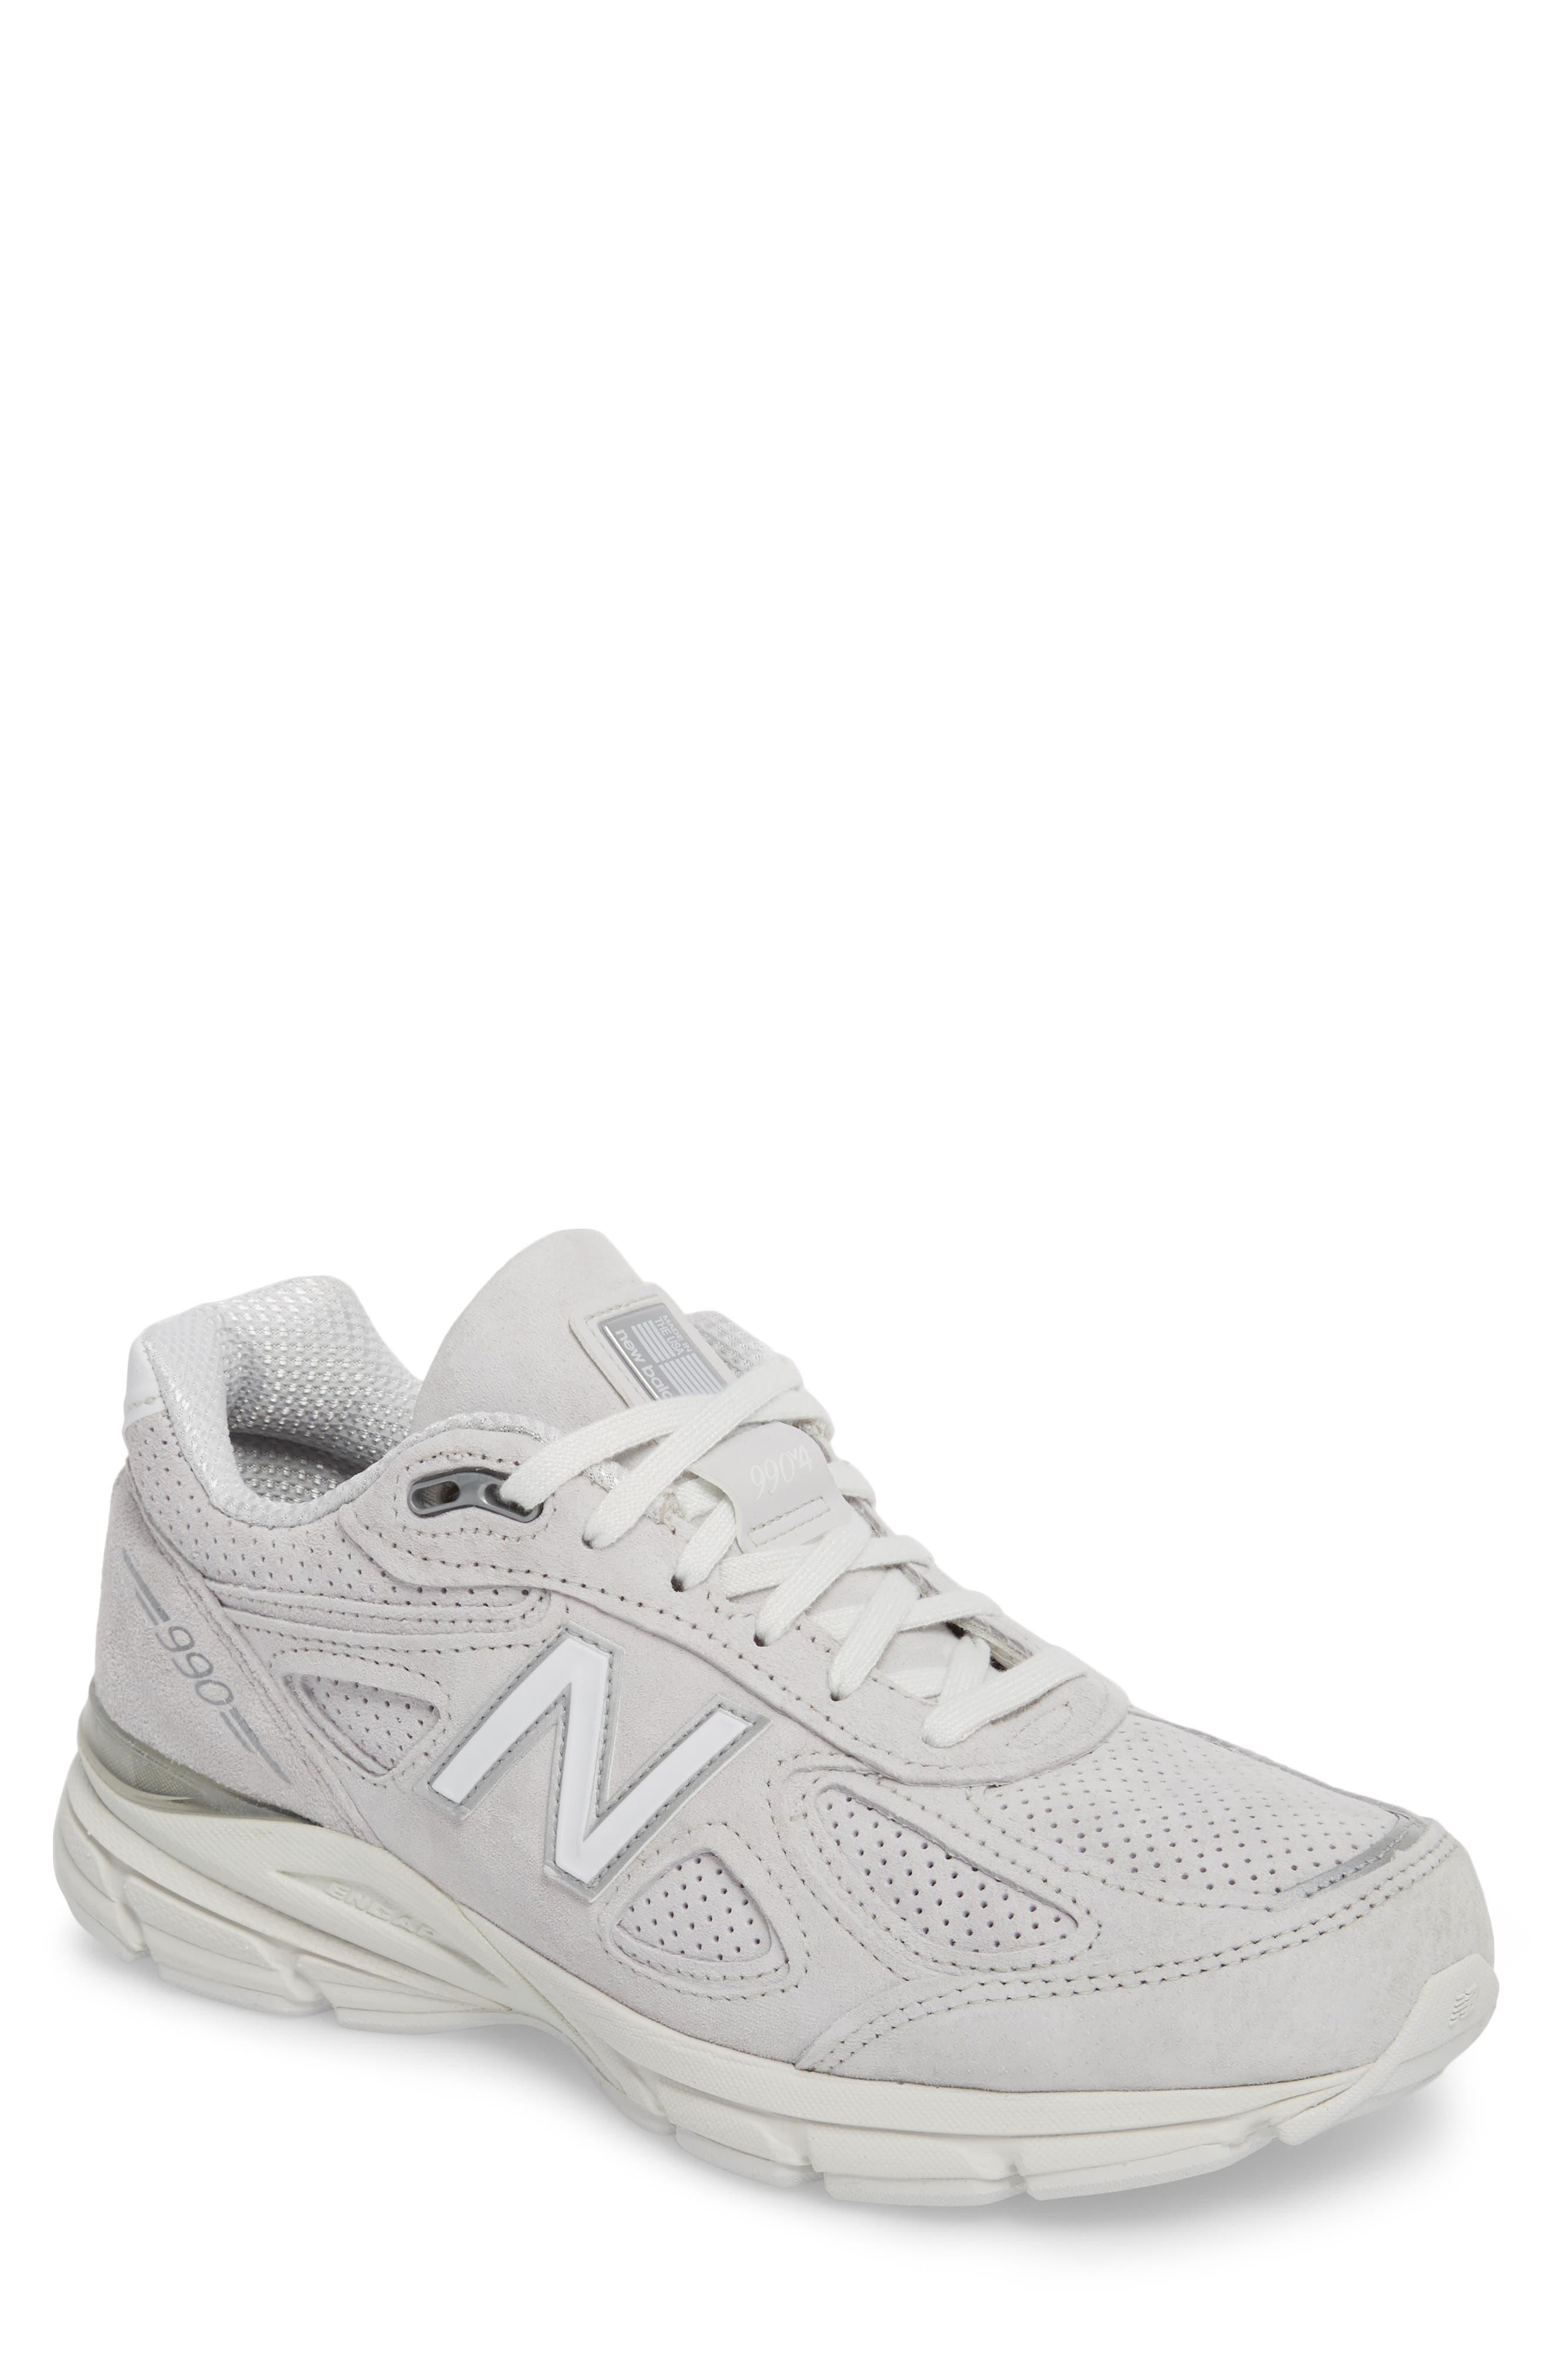 990v4 Perforated Sneaker,                             Main thumbnail 1, color,                             Arctic Fox